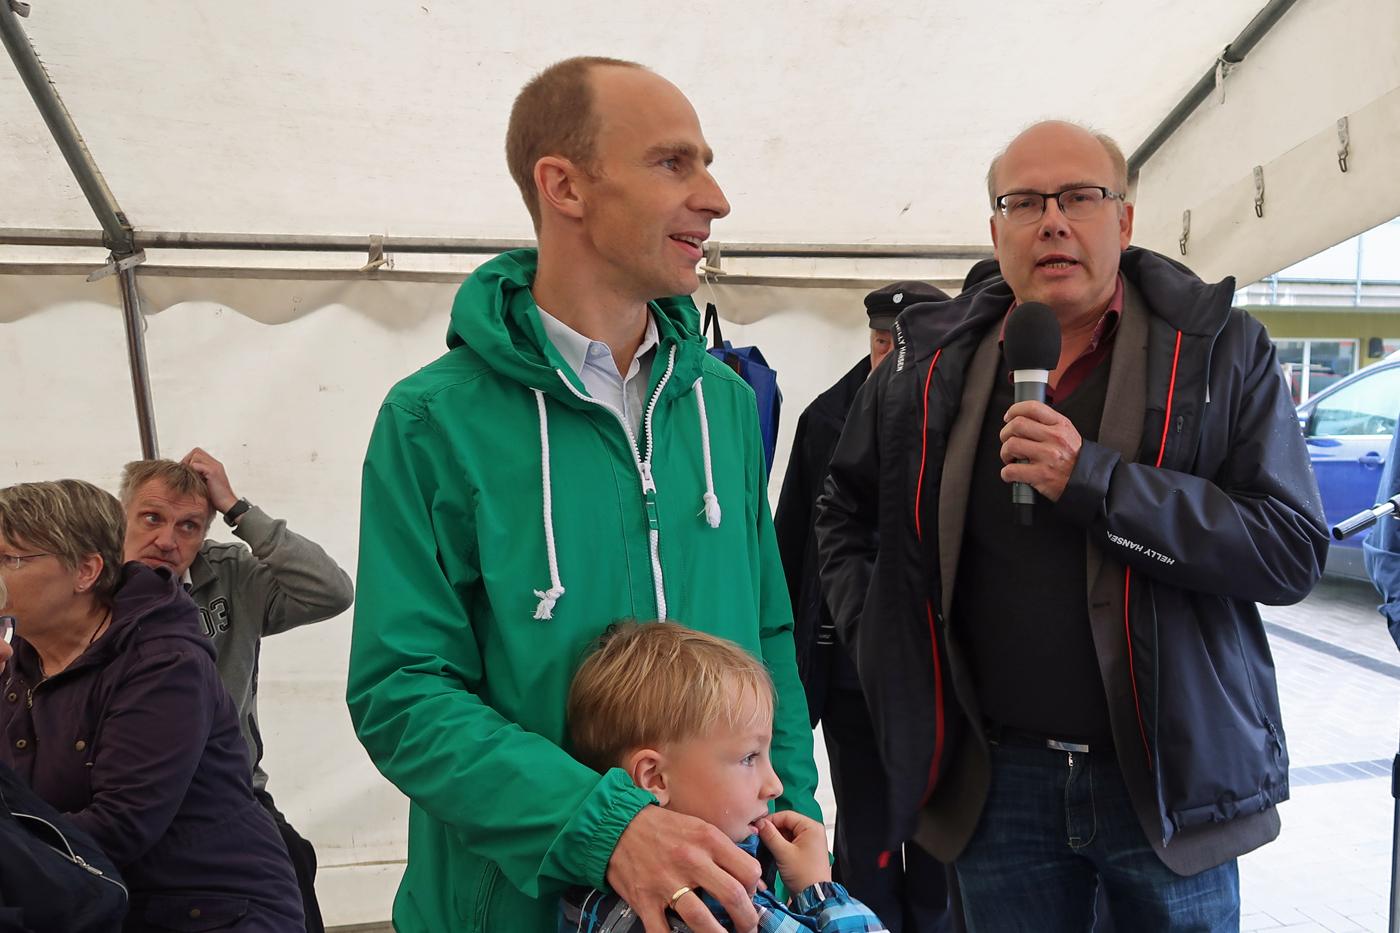 11.08.2017 - links - Dr. Pape (Wohnstätte Stade) mit Pastor Volker Dieterich-Dömröse (Markuskirchengemeinde Hahle)